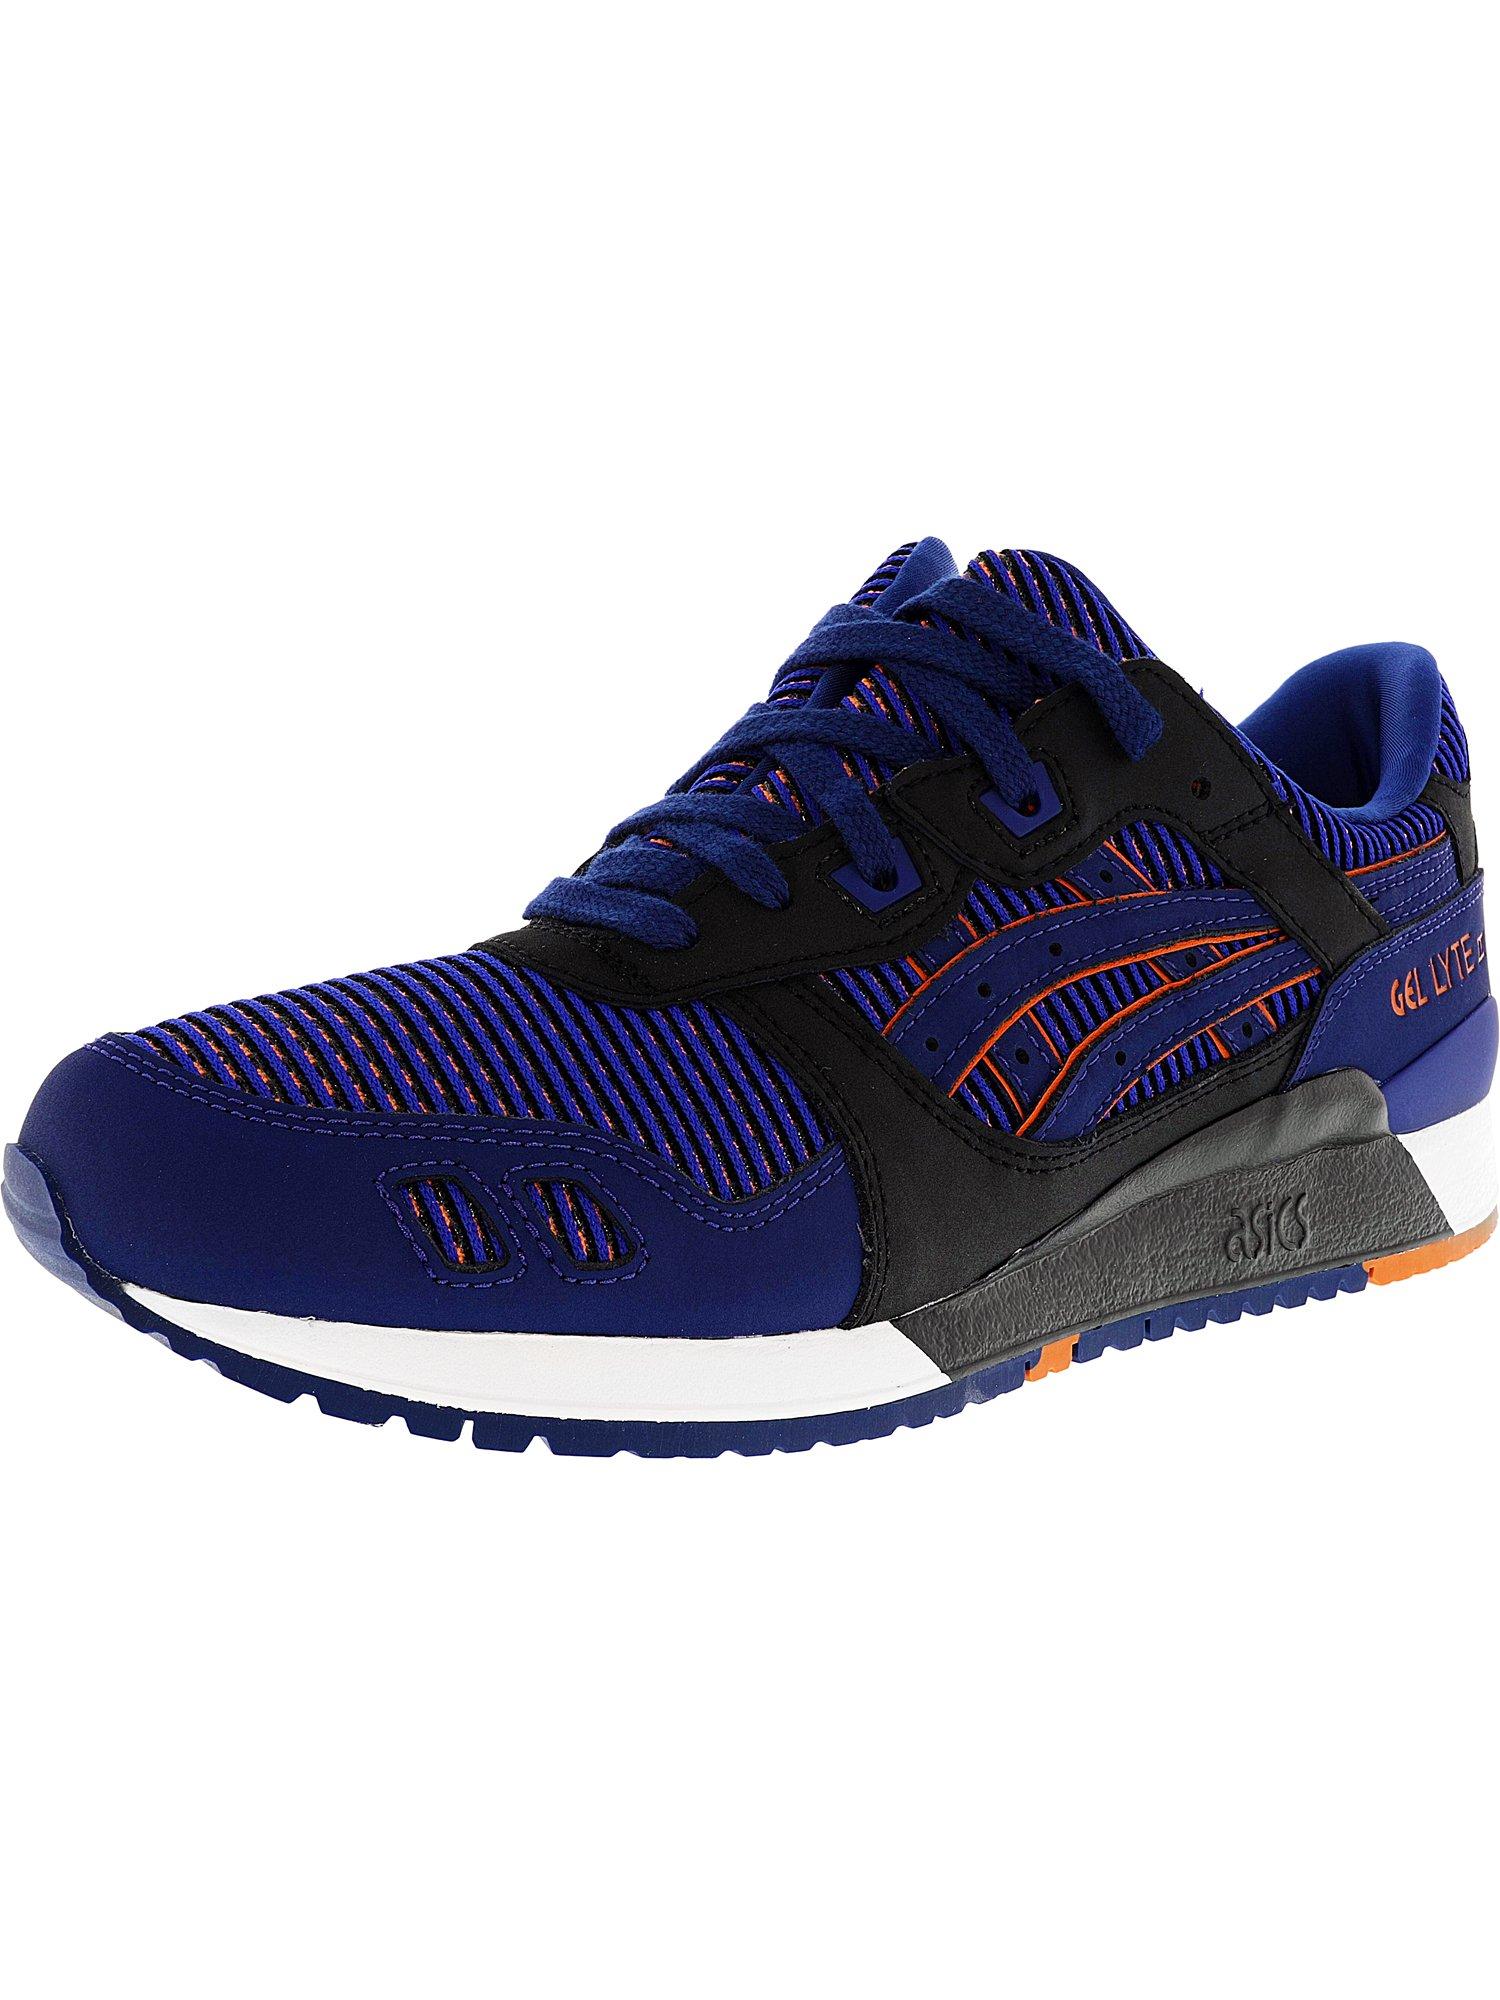 dba559c21c54 Asics Men s Gel-Lyte Iii Medium Grey   Guava Ankle-High Leather Running Shoe  - 8M